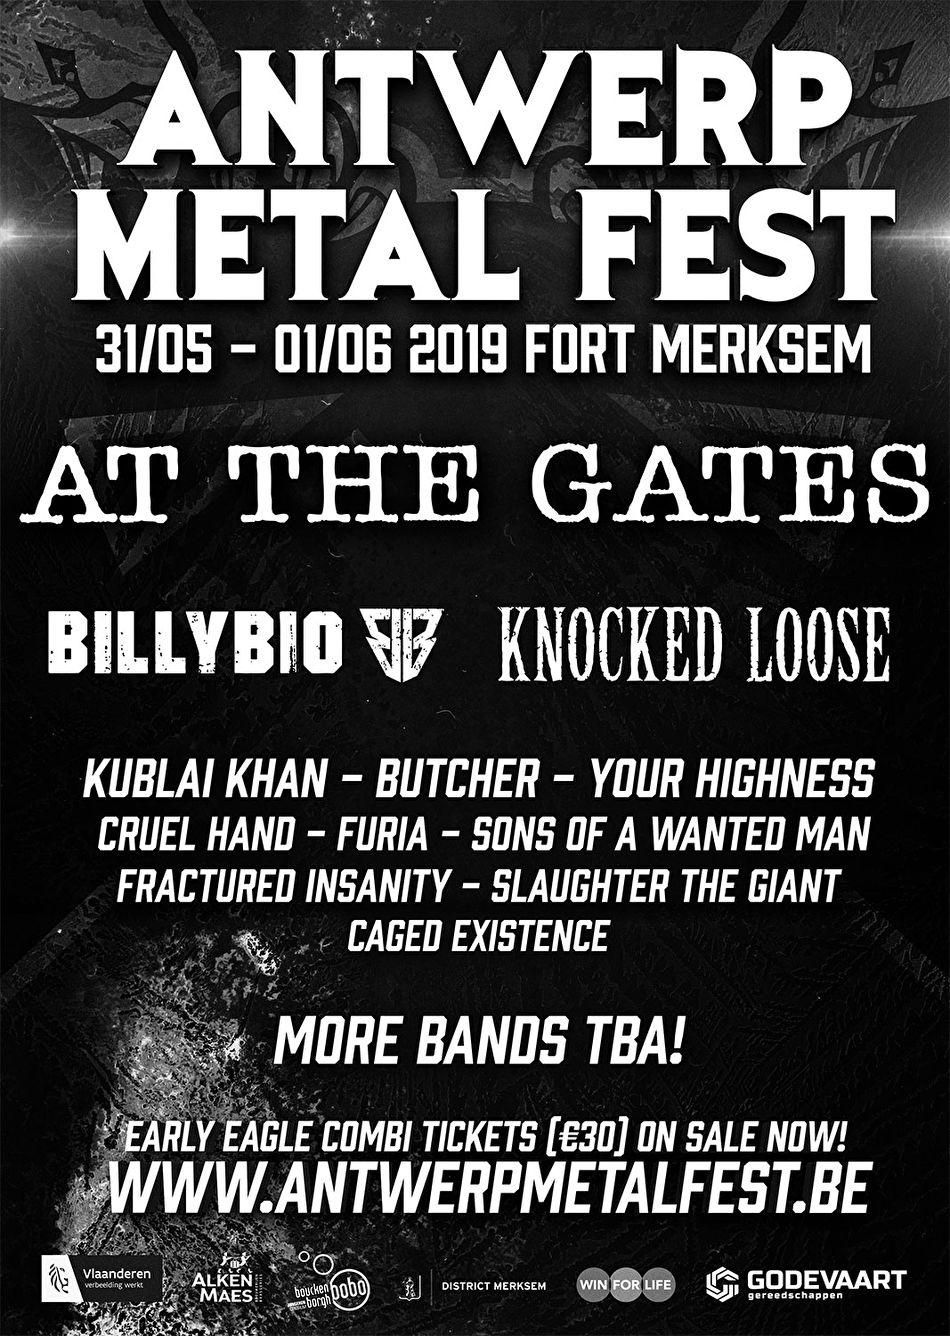 Voorlopige affiche Antwerp Metal Fest 2019